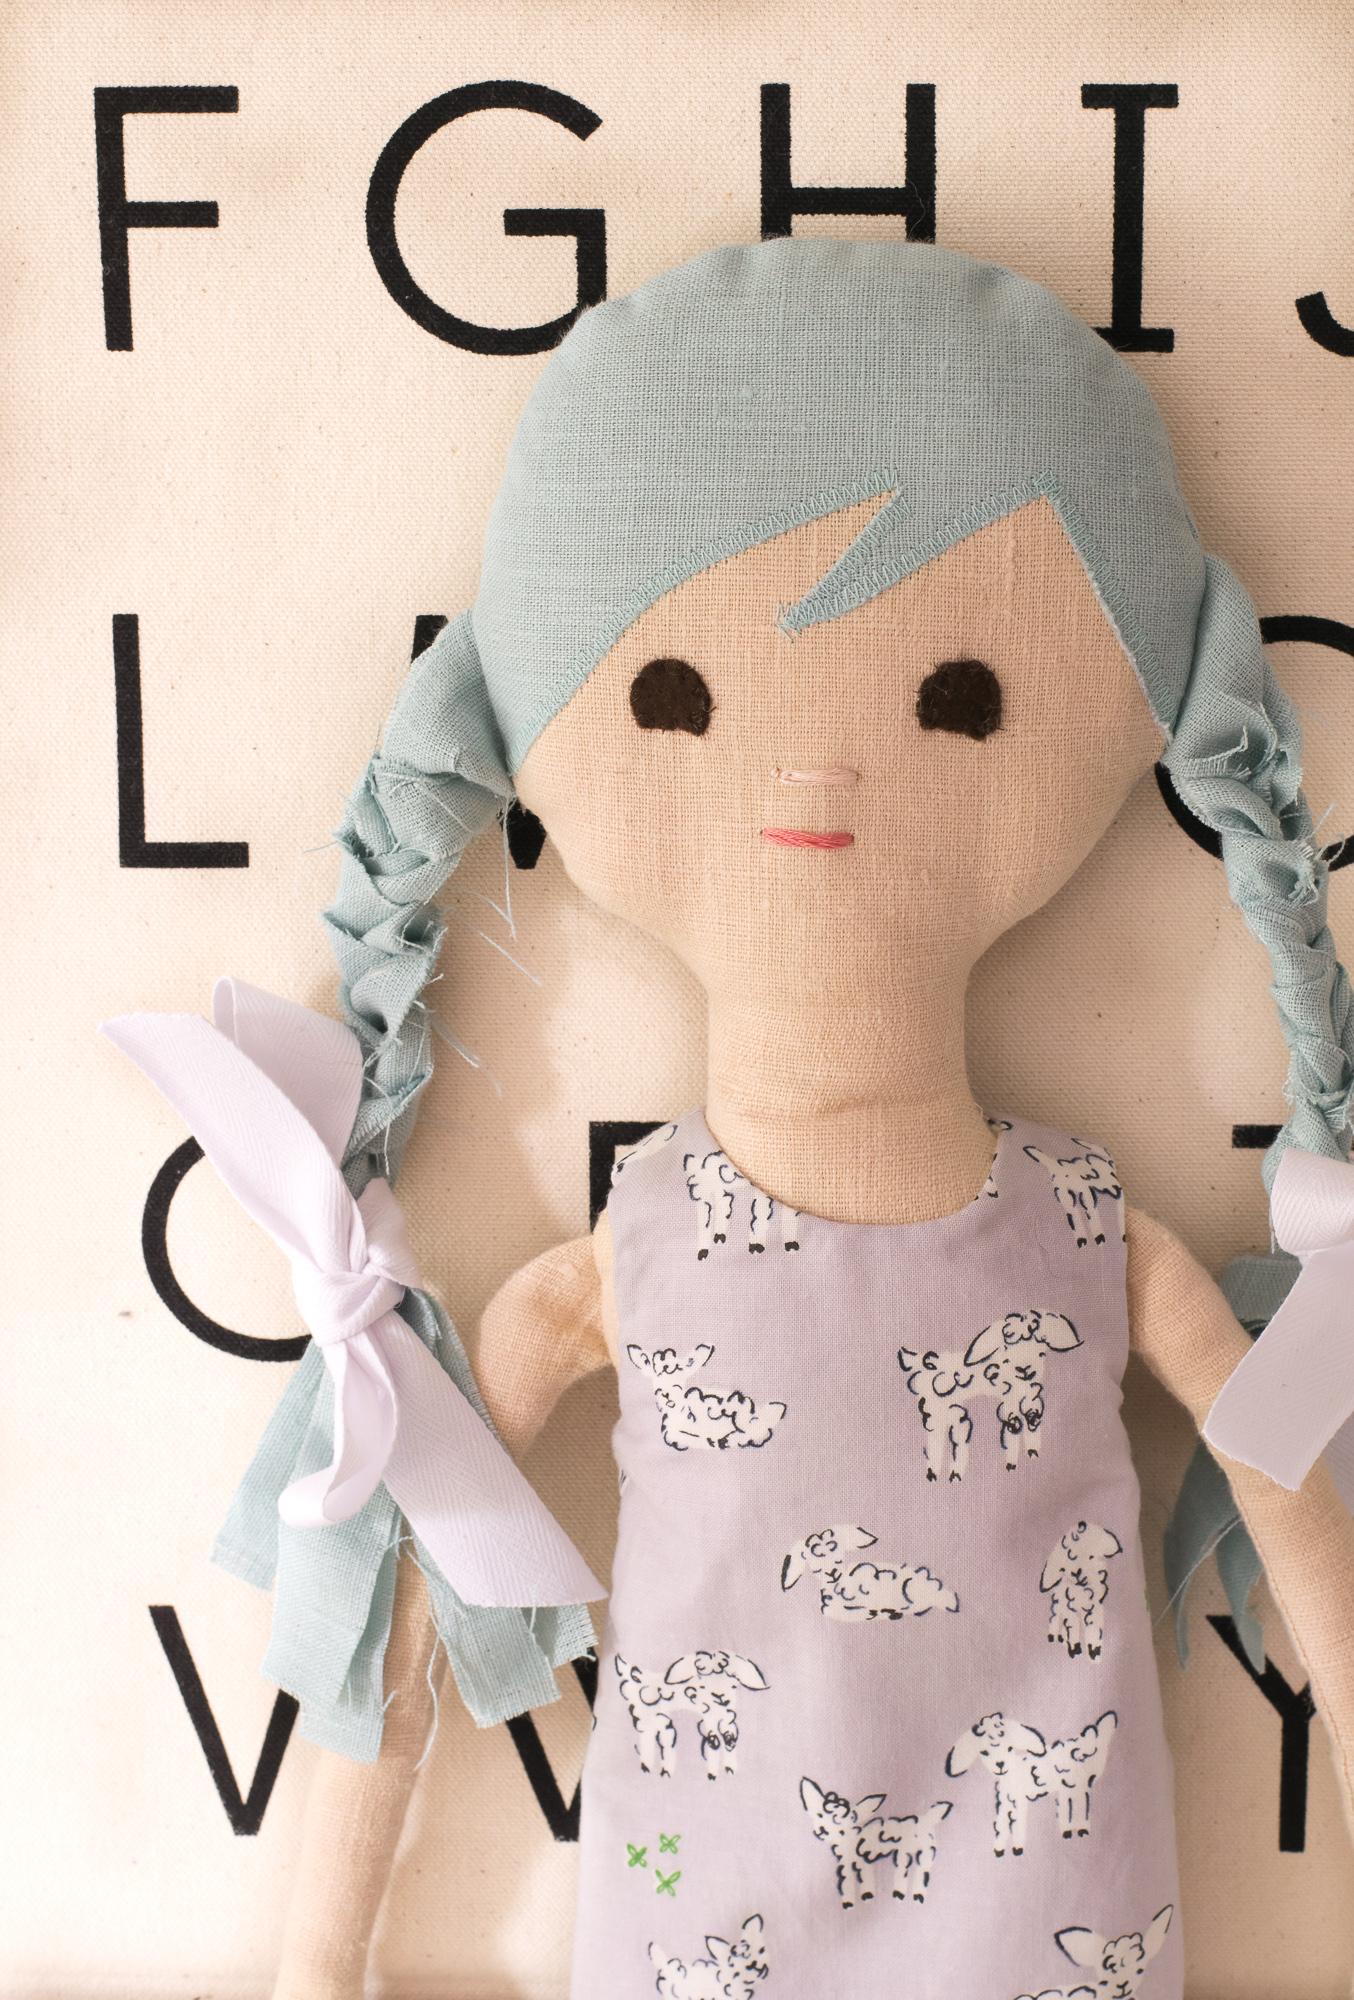 Gallery of Dolls-28.jpg